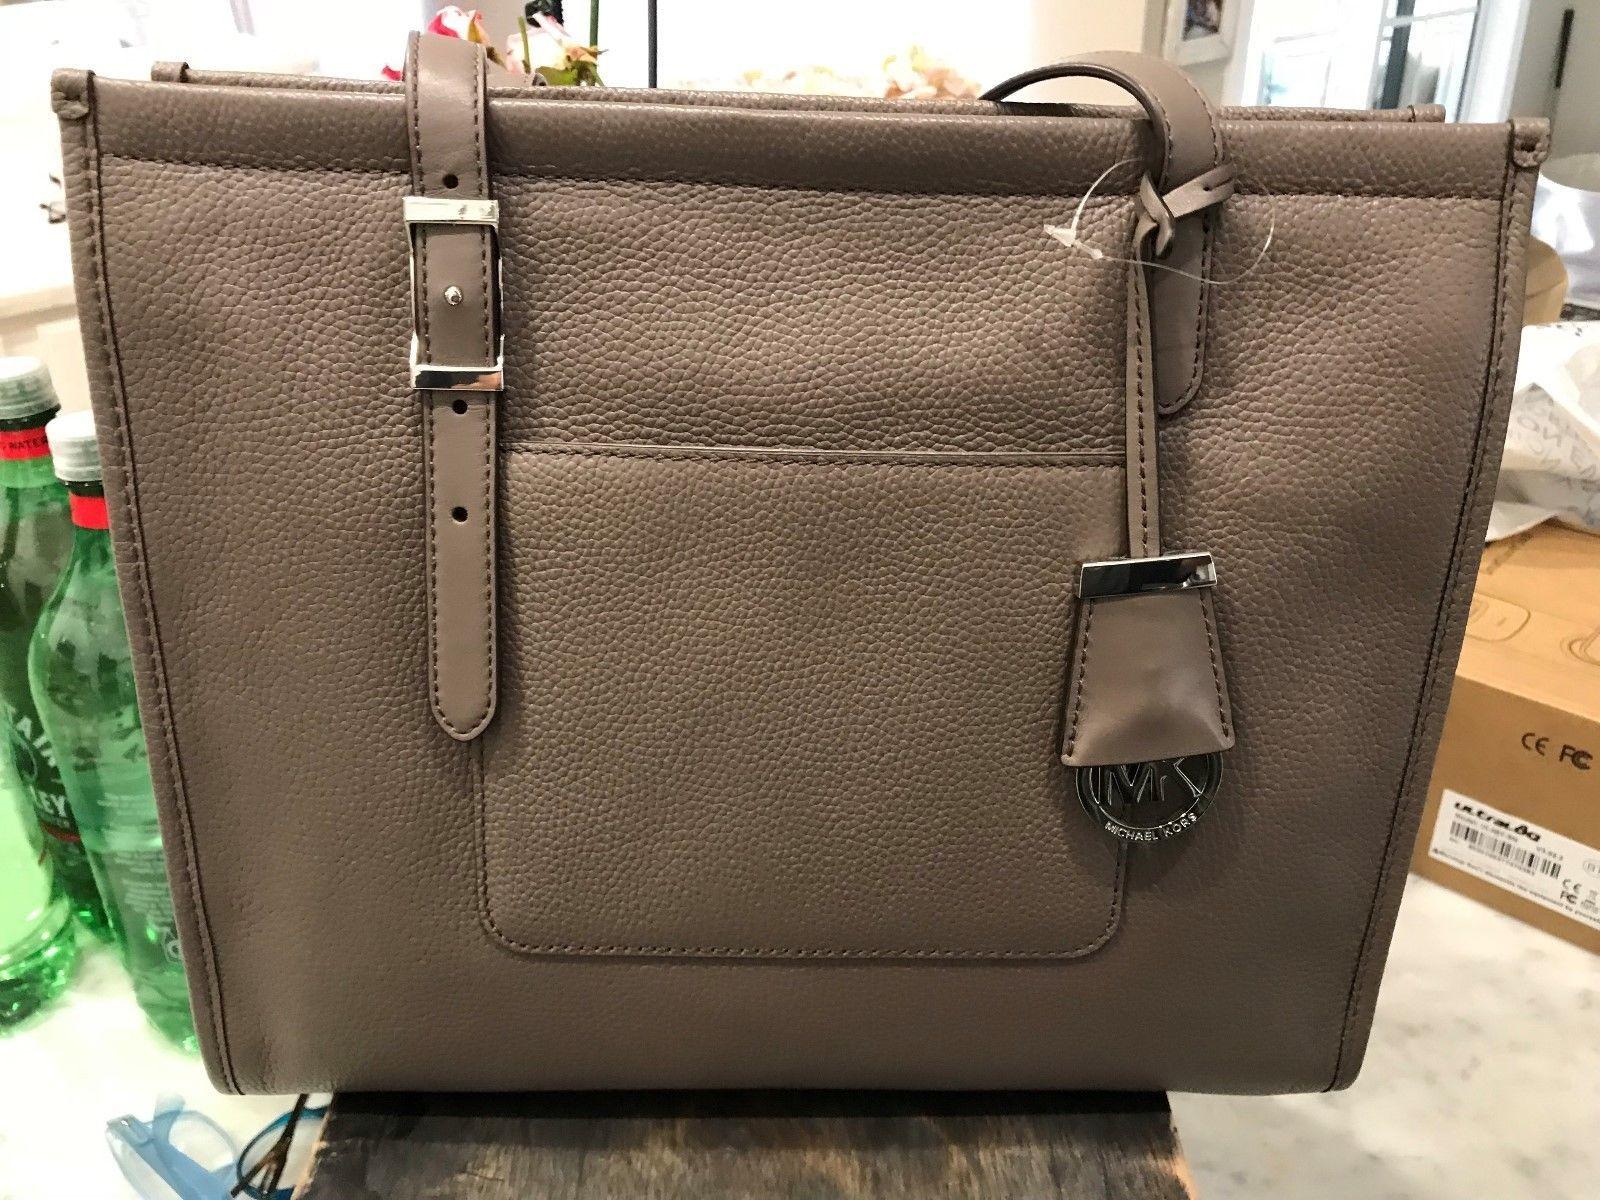 3009073bde497f ... Michael Kors Darien Medium Shoulder Tote Bag Pebbled Leather Cinder  (taupe grey) ...